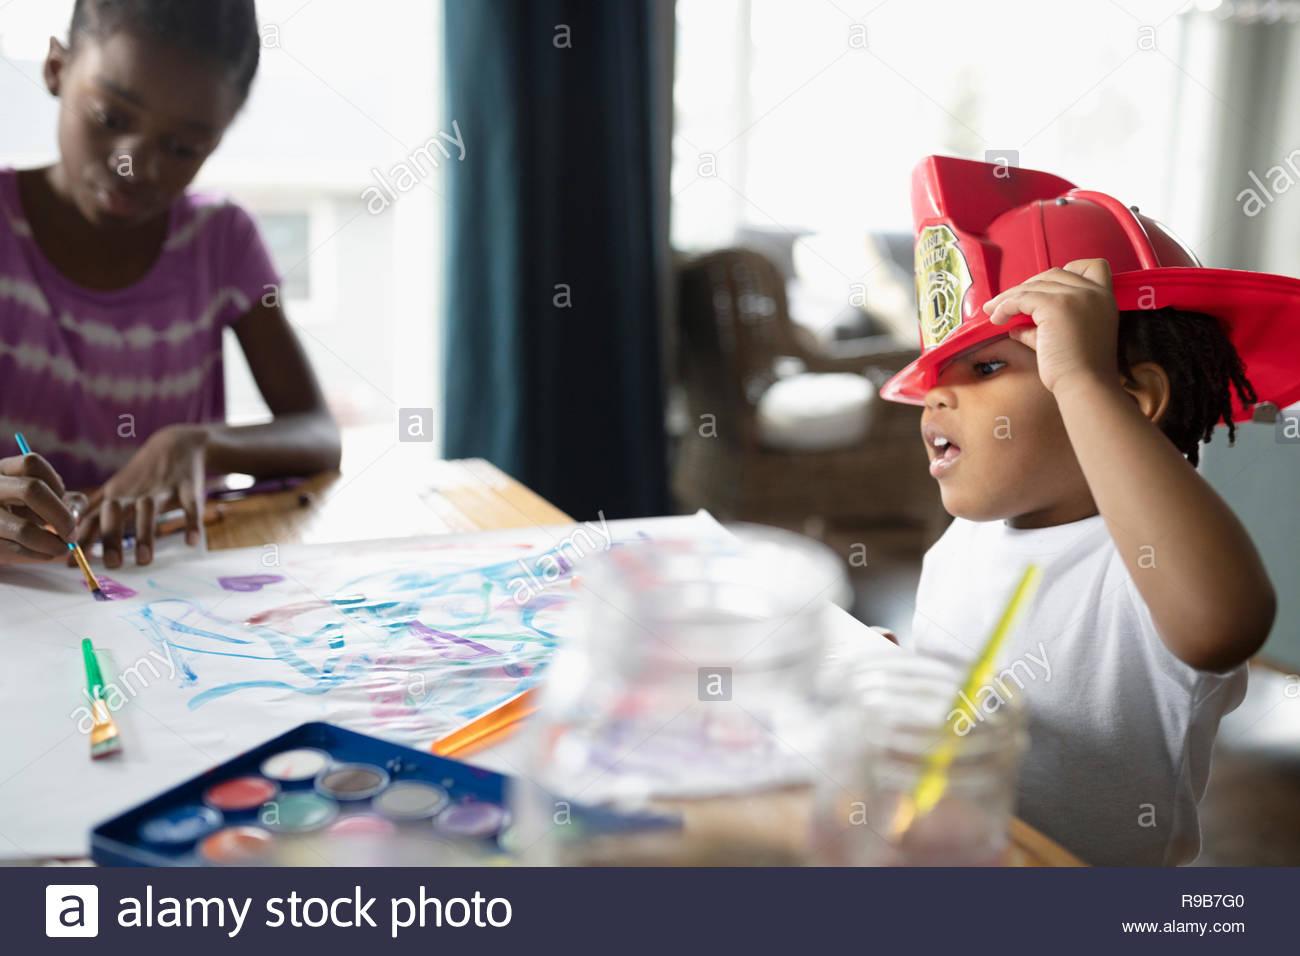 Lindo niño niño usando casco de bombero y pintura en mesa de comedor Imagen De Stock